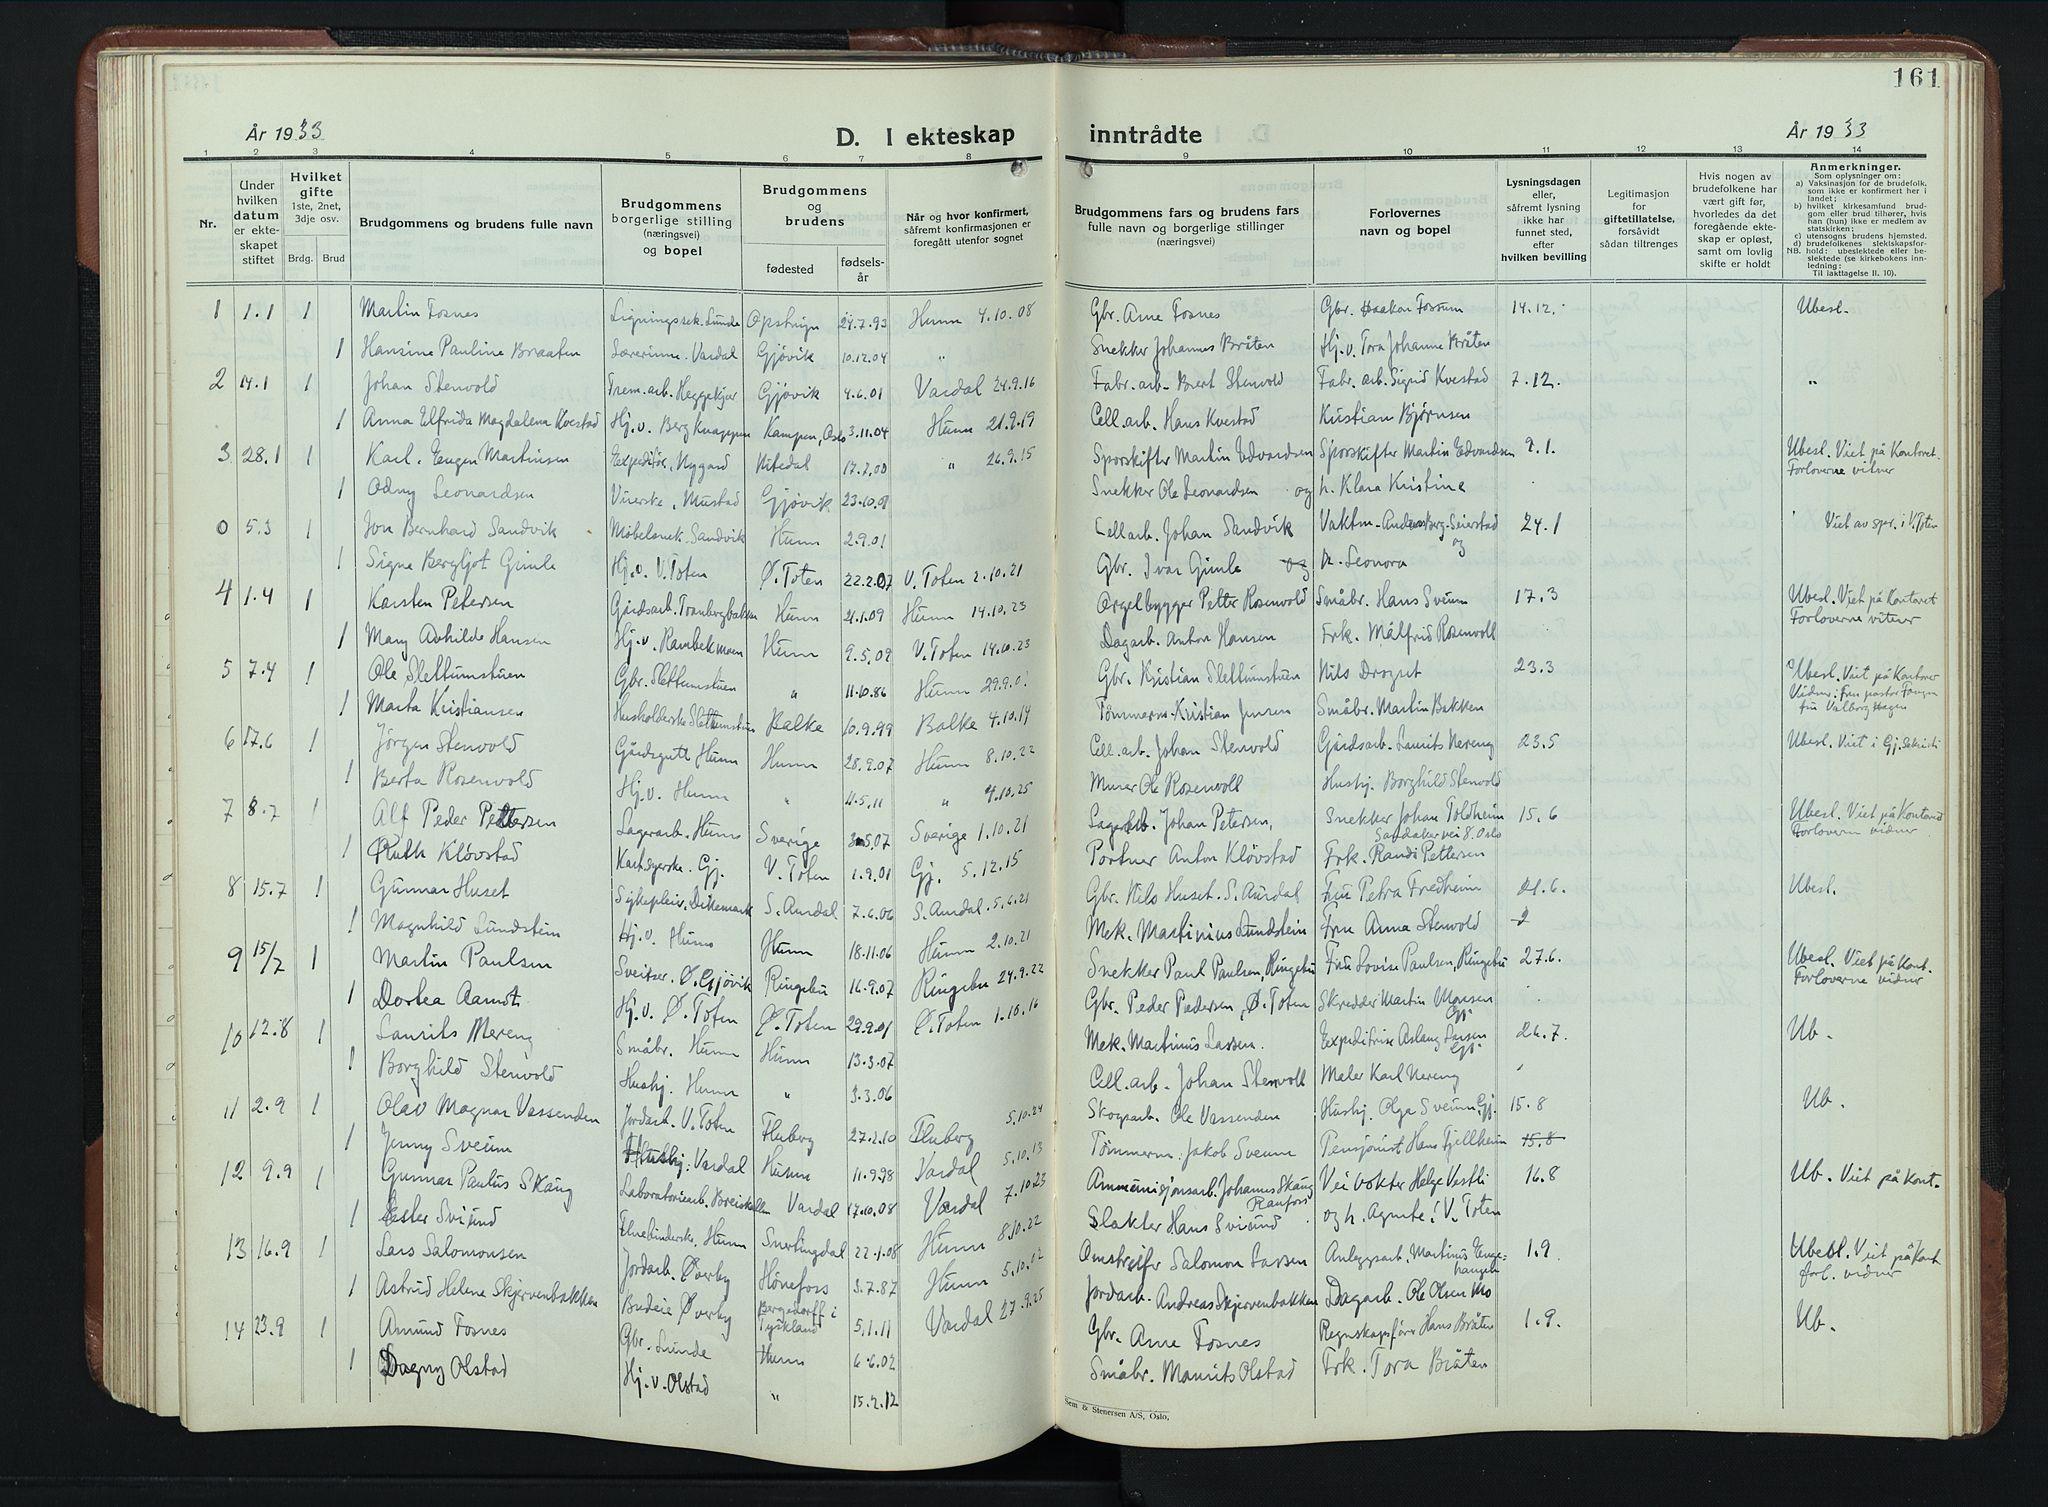 SAH, Vardal prestekontor, H/Ha/Hab/L0023: Klokkerbok nr. 23, 1929-1941, s. 161